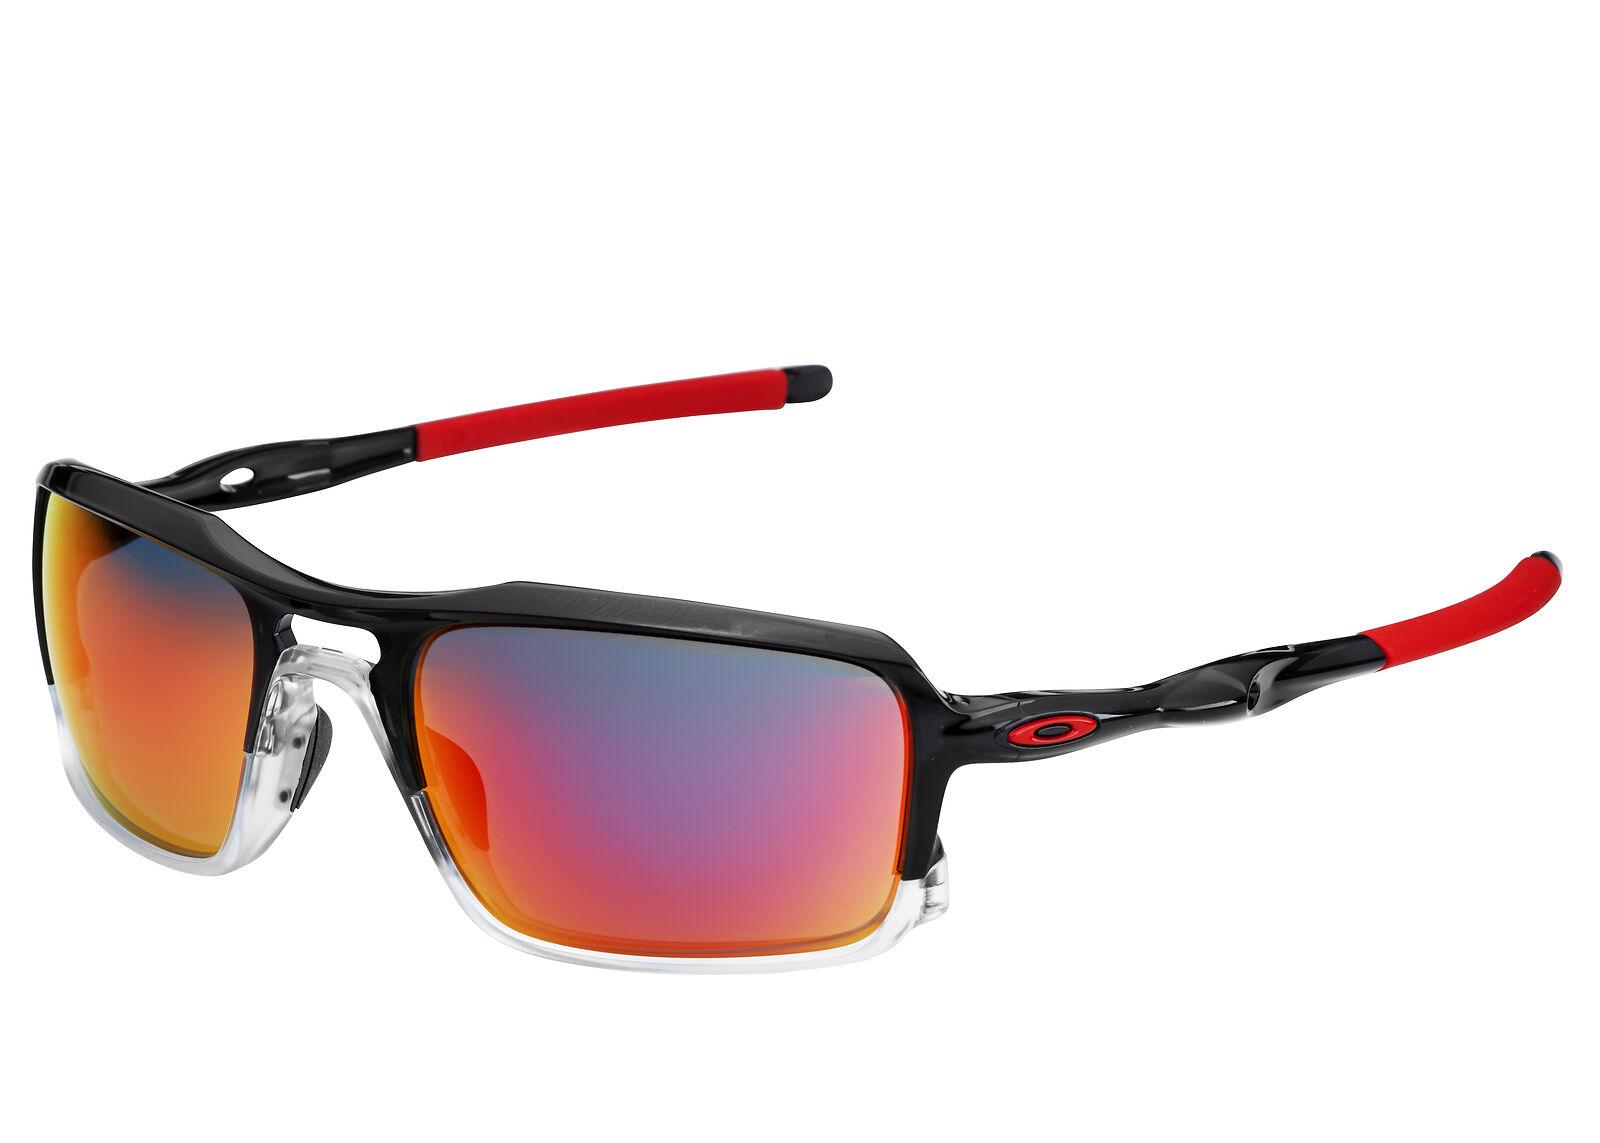 c62ffa7c560e7 Oakley Triggerman OO9266-10 Black Ink With Ruby Iridium Lens 9266 10  Sunglasses